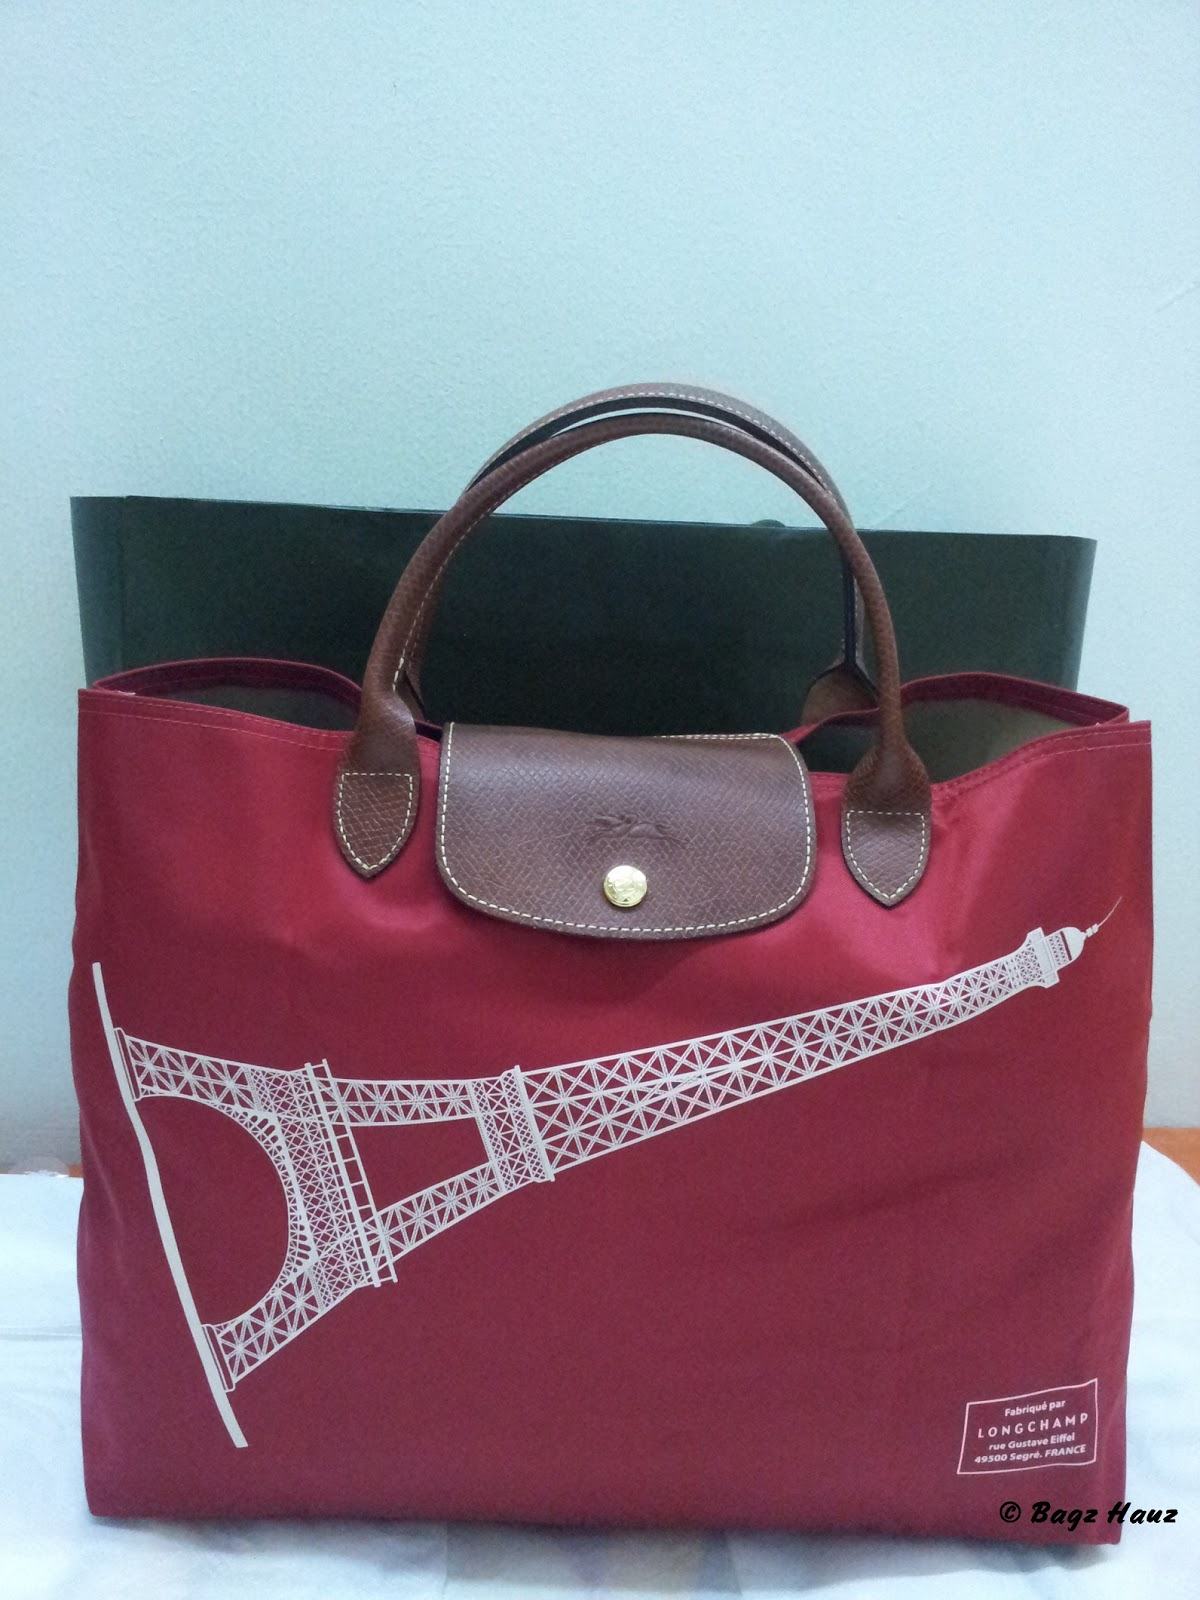 3cb06baff0db Bagz Hauz Fashion: **SOLD-OUT** ~ LONGCHAMP Ready Stocks in Hand